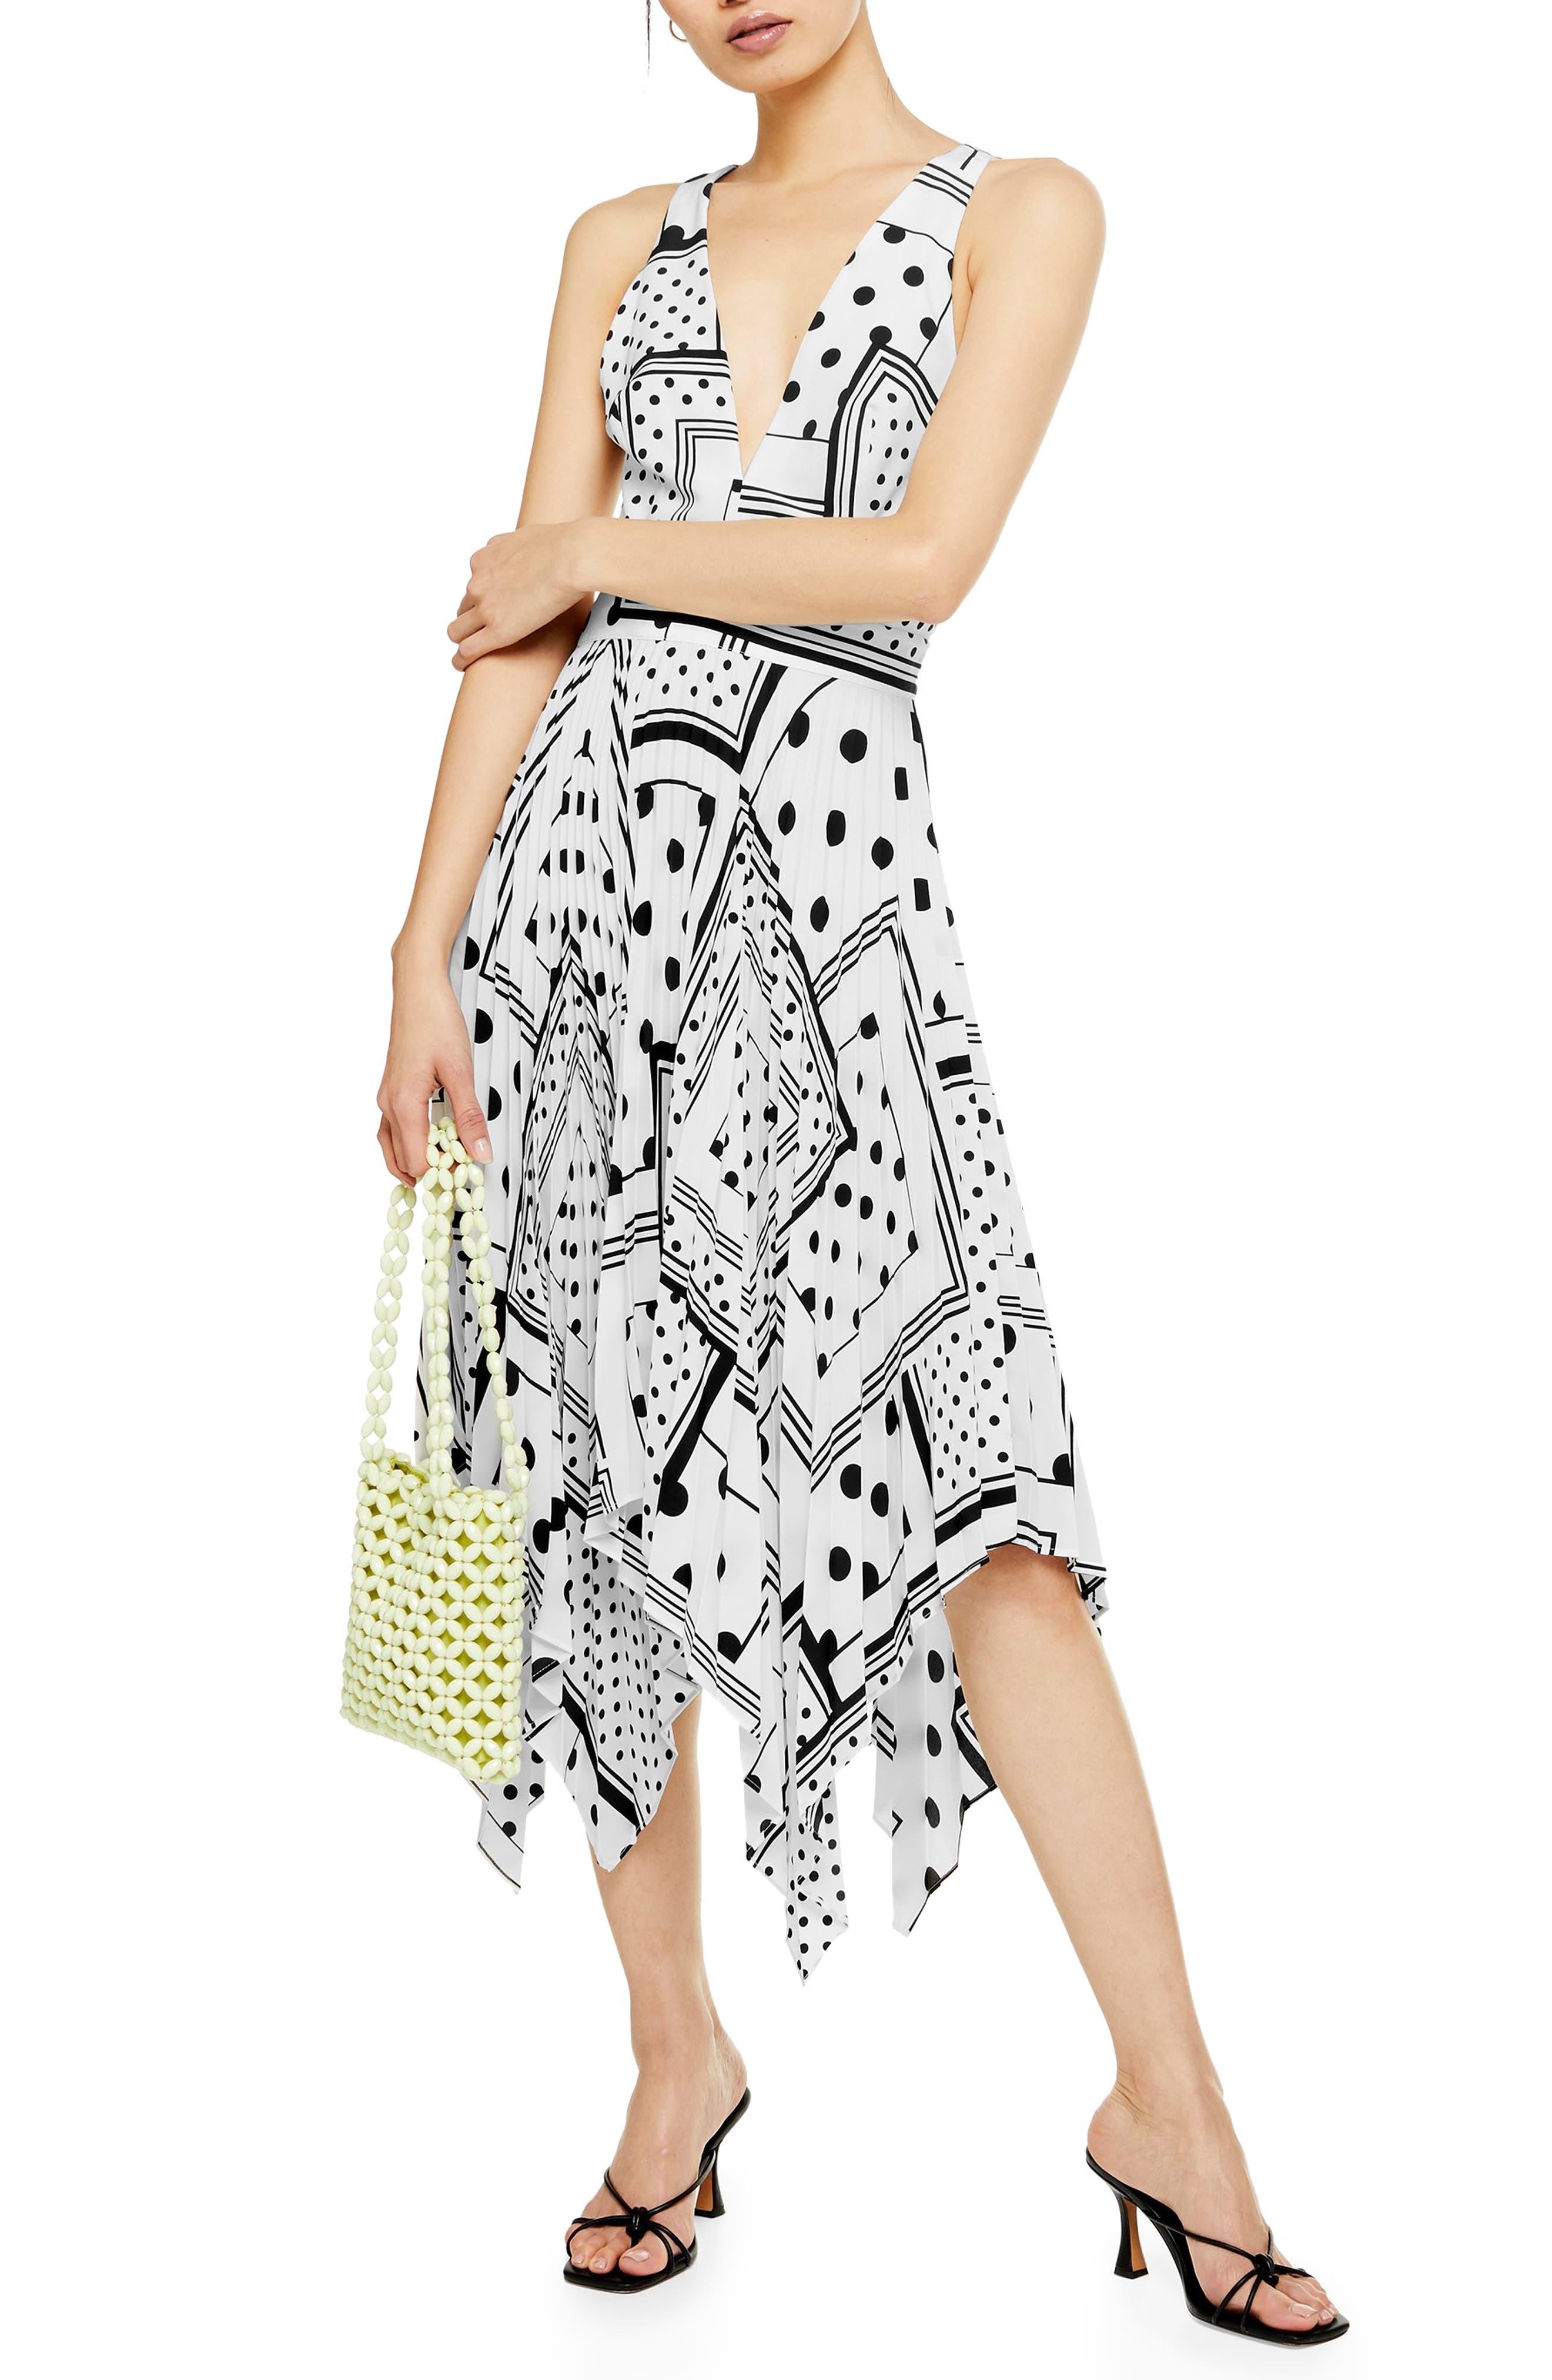 Topshop Spot Print Pleated Pinafore Dress, US (fits like 10-12) - White